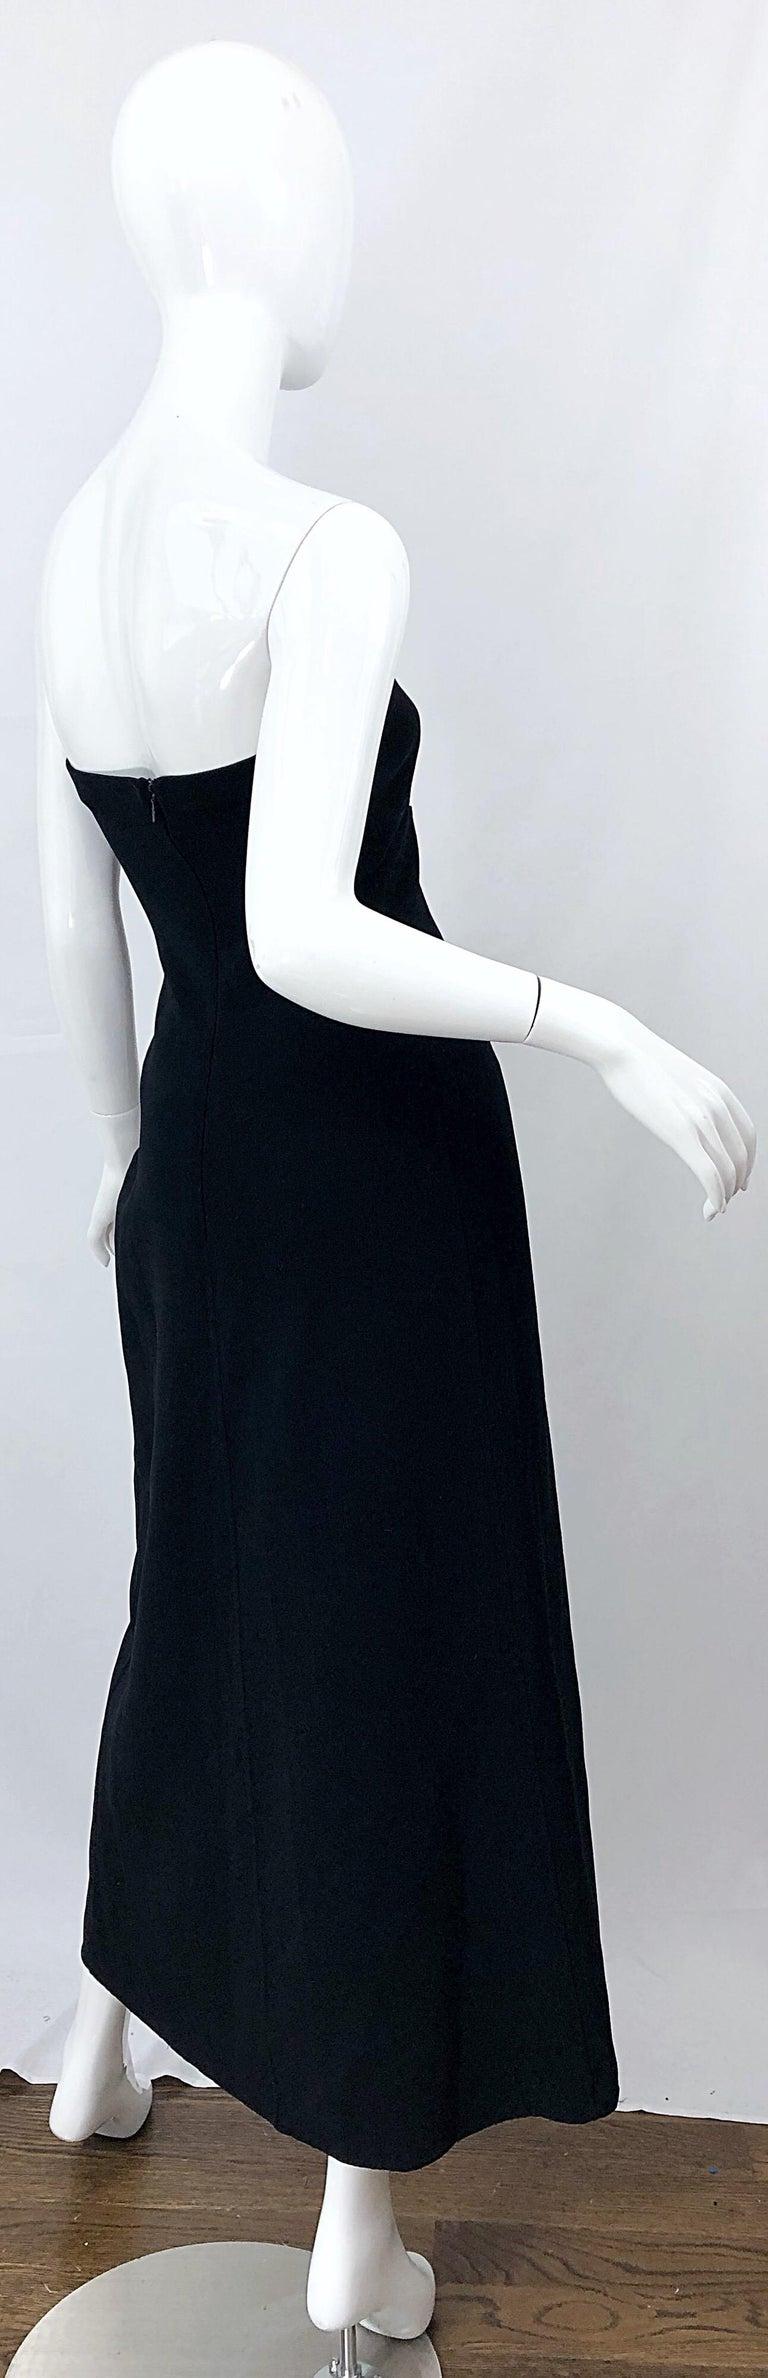 1990s Donna Karan New York Size 4 Black Strapless Vintage 90s Gown Maxi Dress For Sale 2